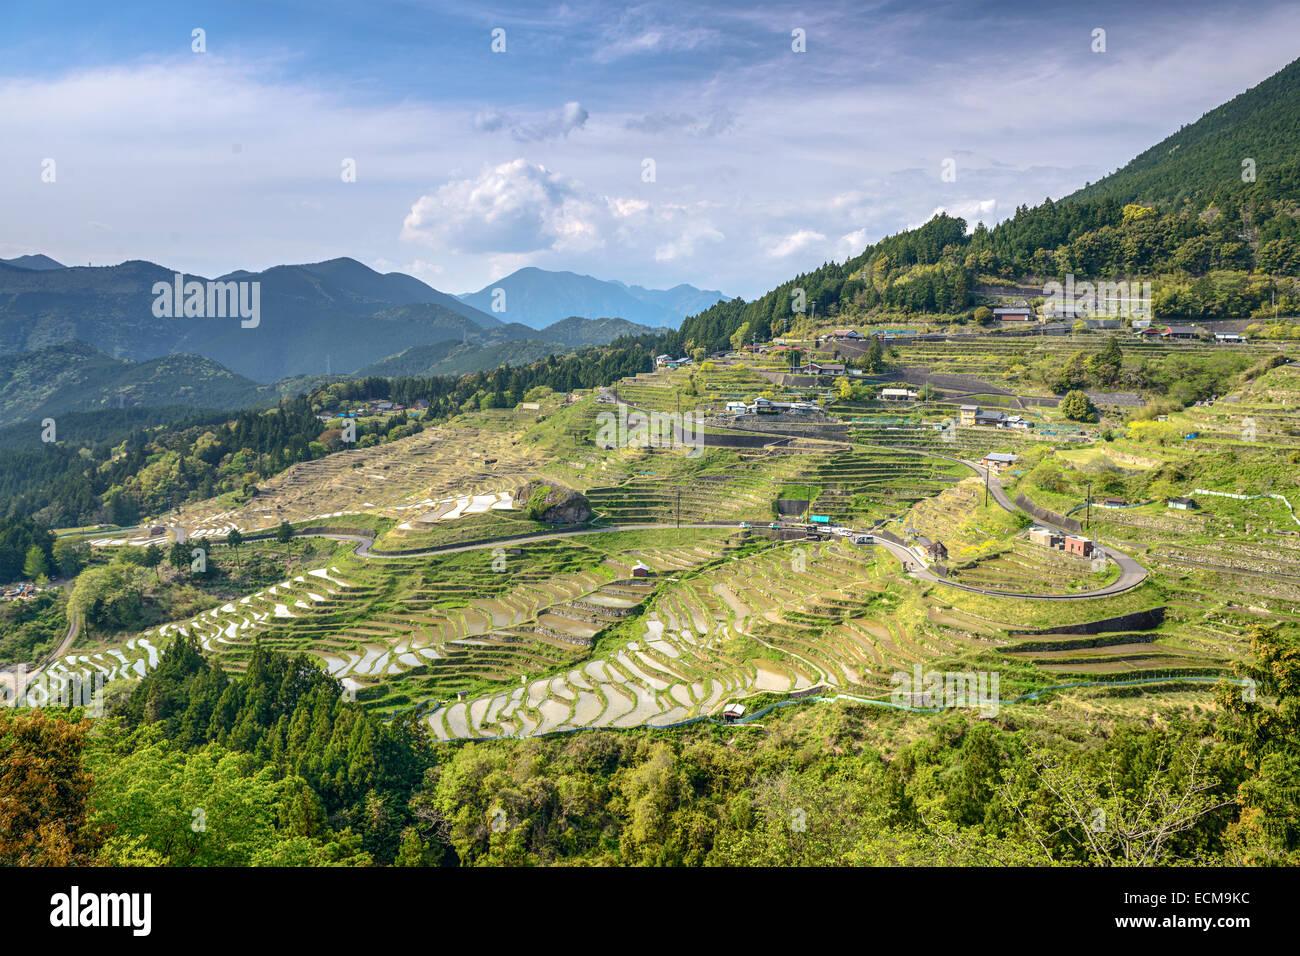 Rice terraces at Maruyama Senmaida in Kumano, Mie Prefecture, Japan. - Stock Image